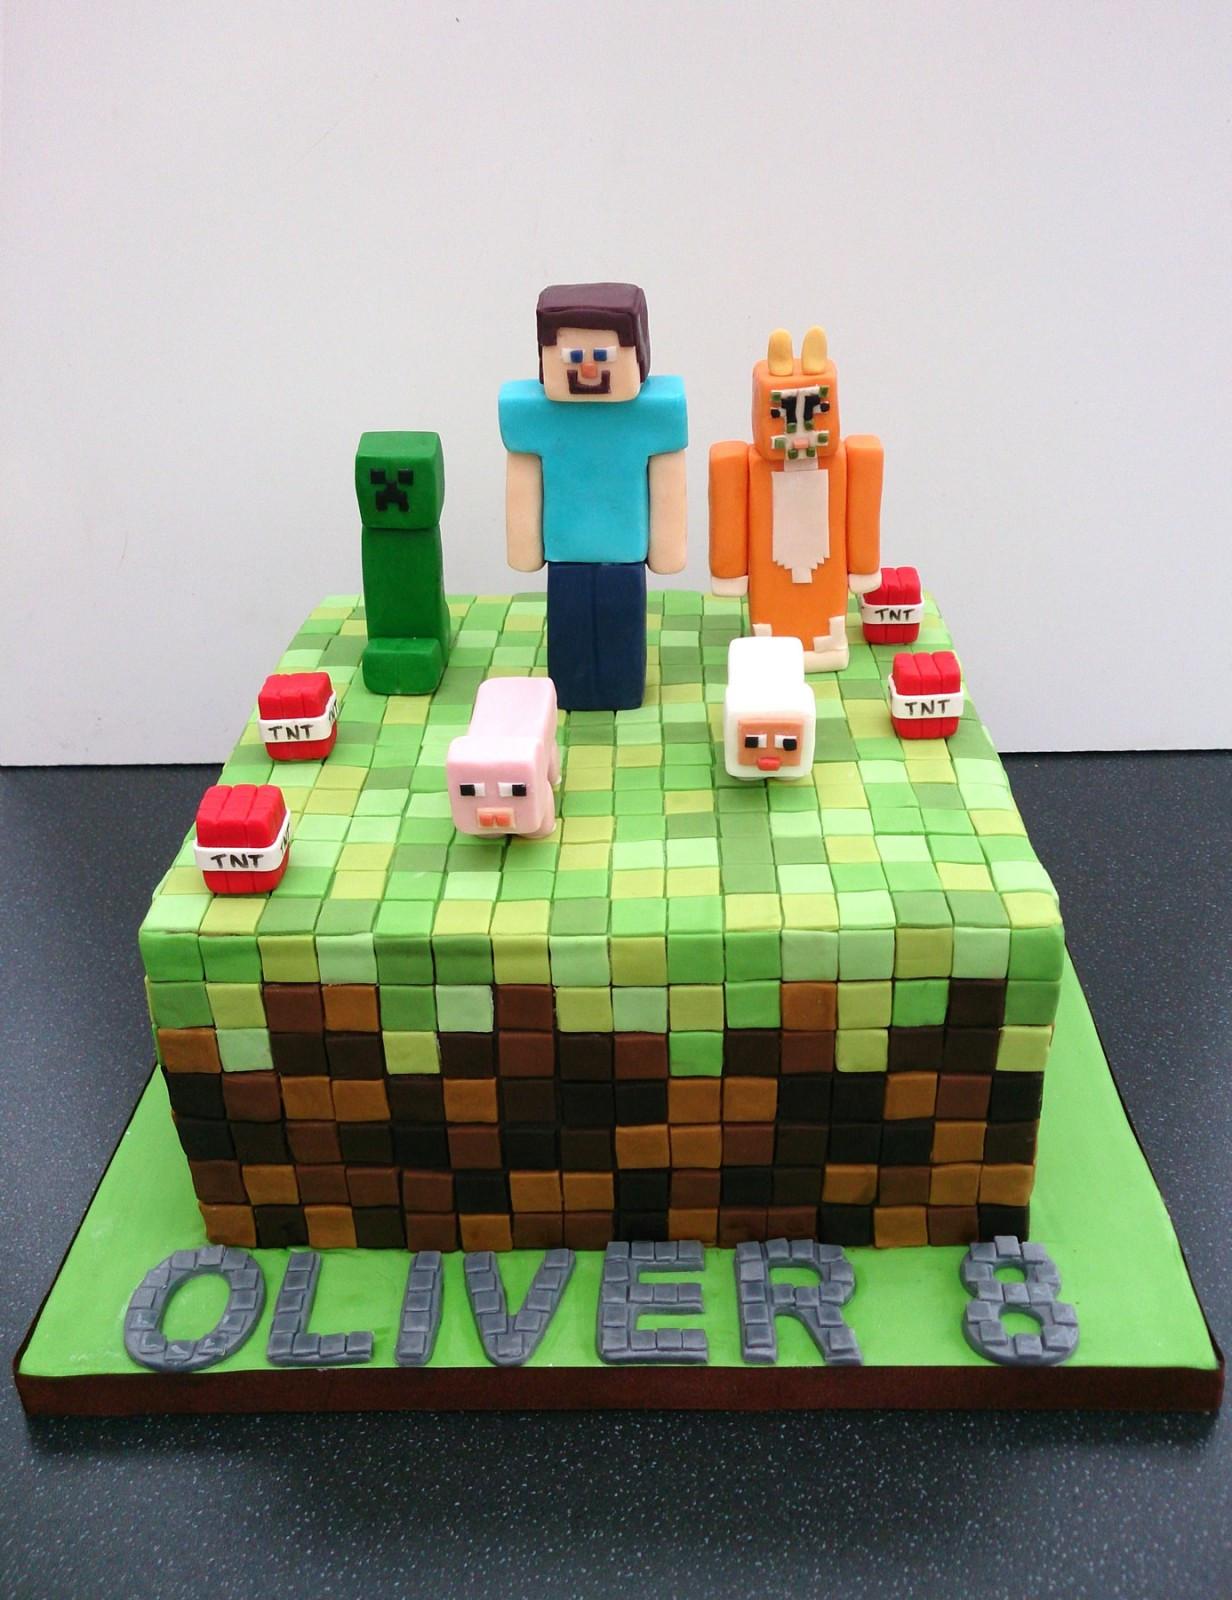 How To Make A Minecraft Birthday Cake  Minecraft Birthday Cake Susie s Cakes